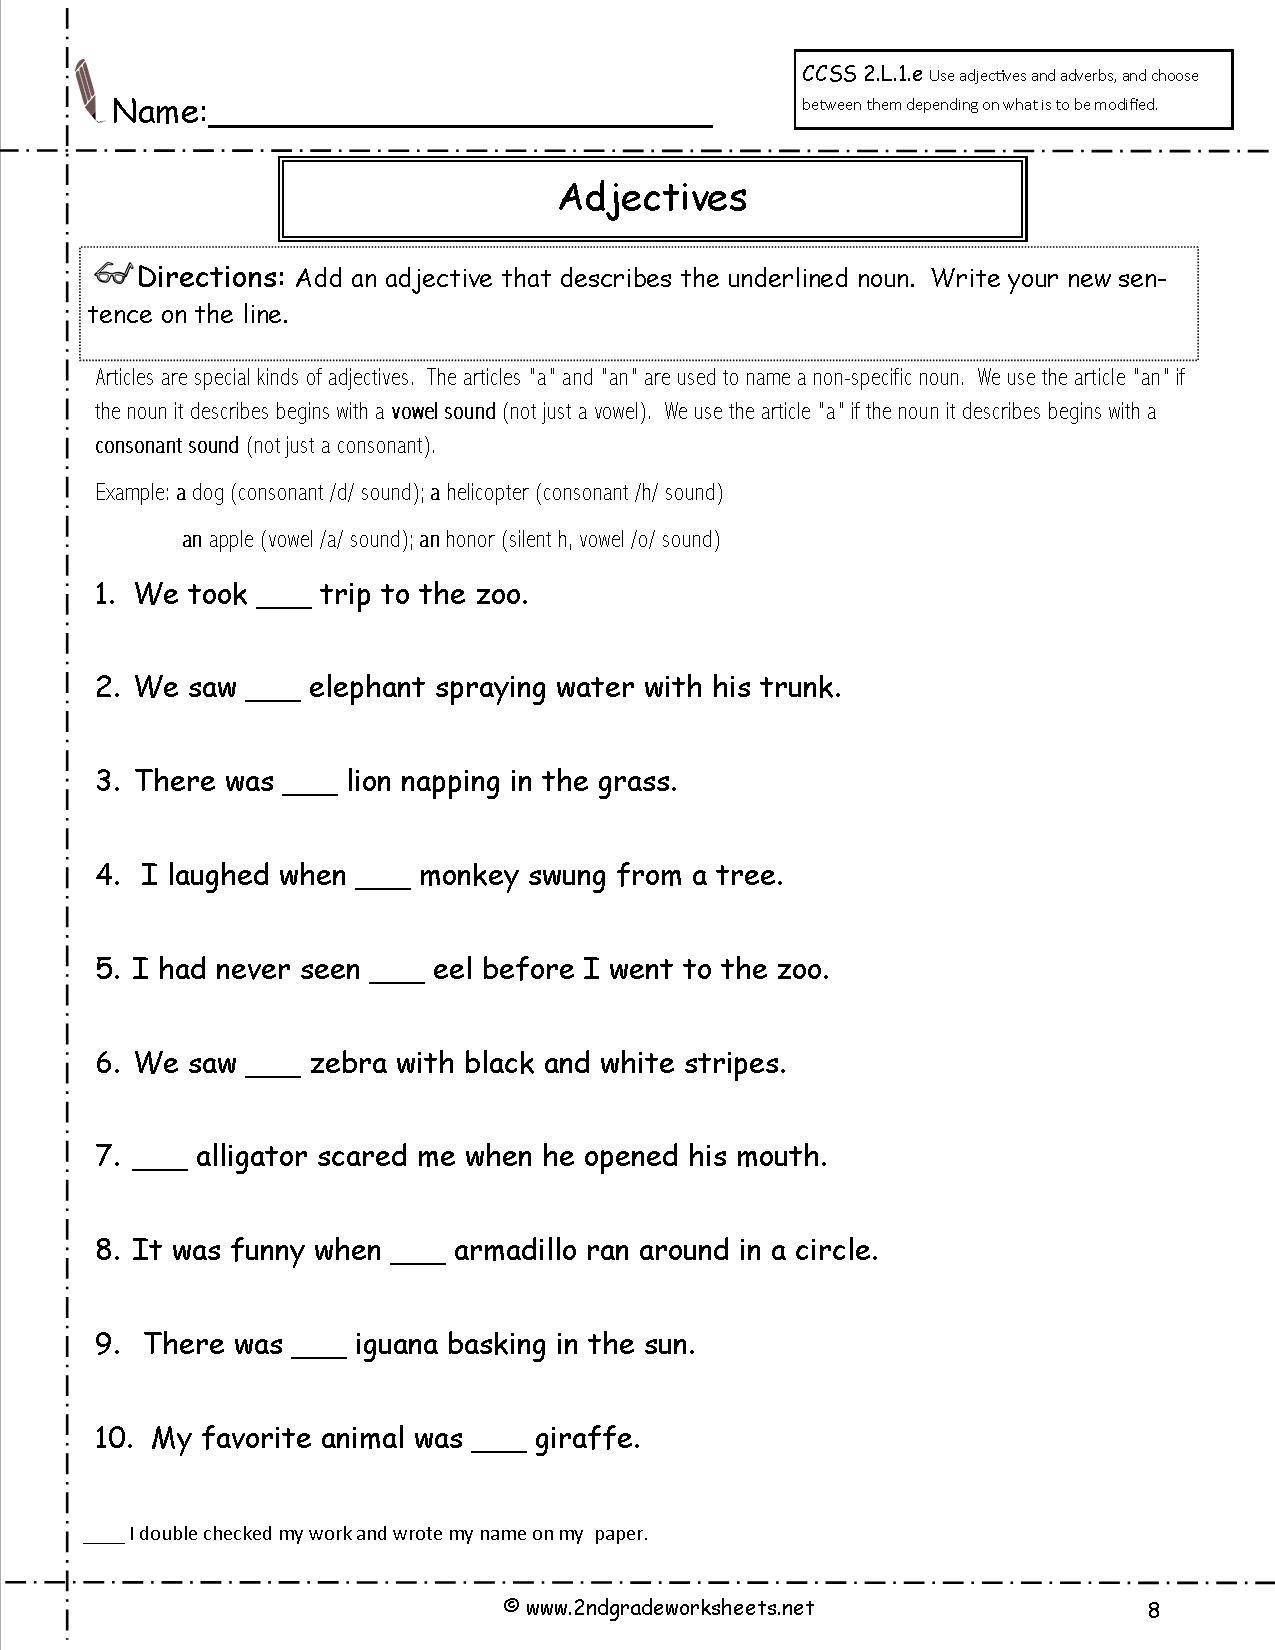 Free Language/grammar Worksheets And Printouts | Printable Grammar Worksheets